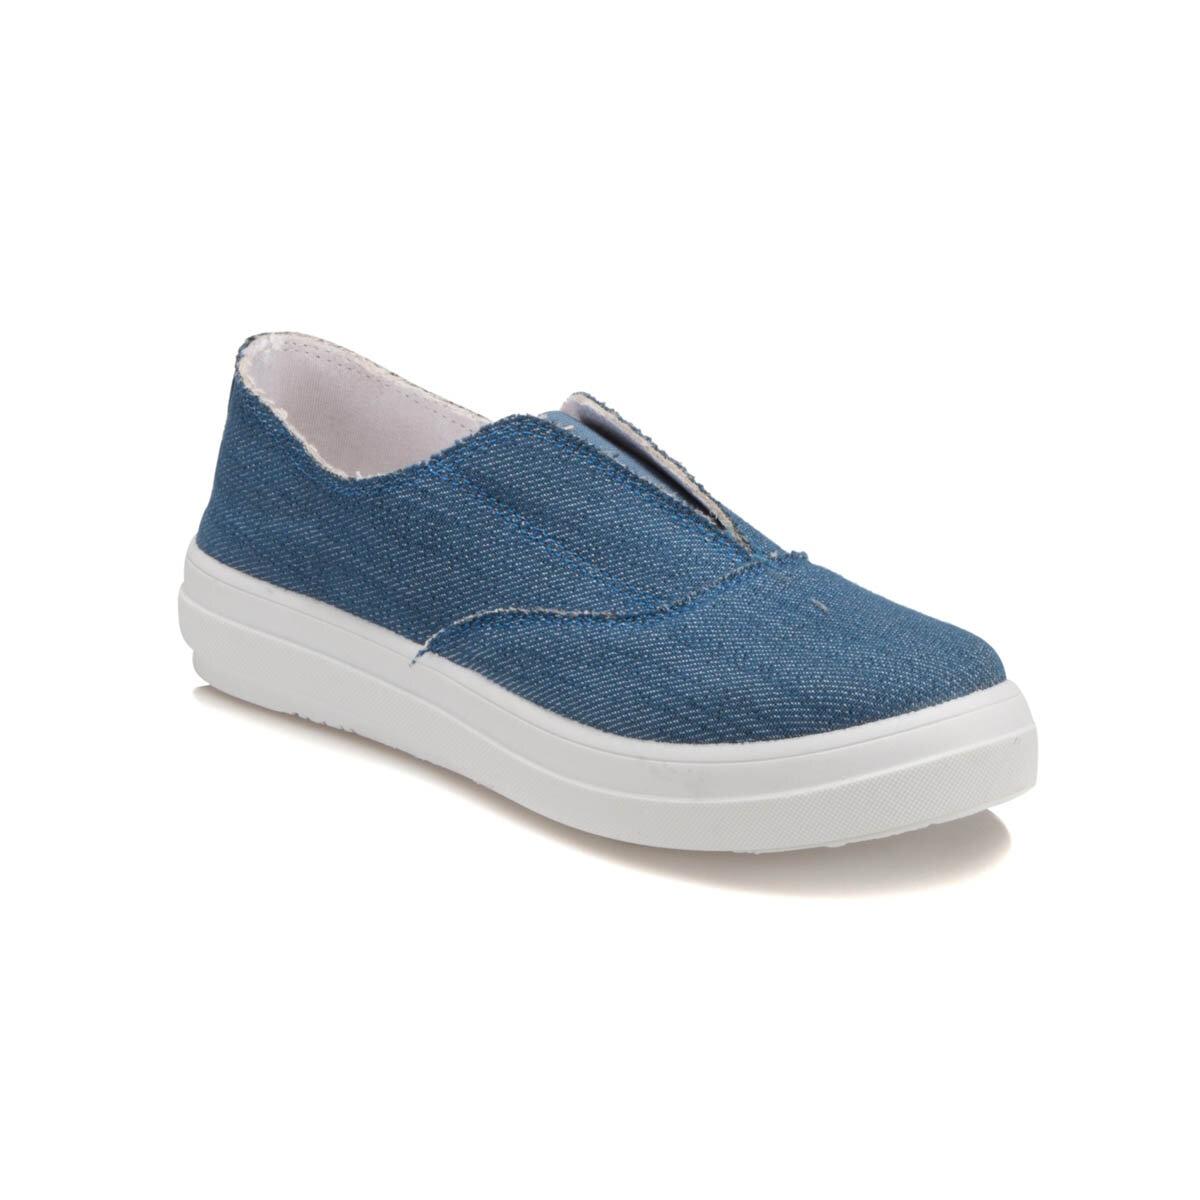 FLO U2503 Indigo Women Slip On Shoes Carmens